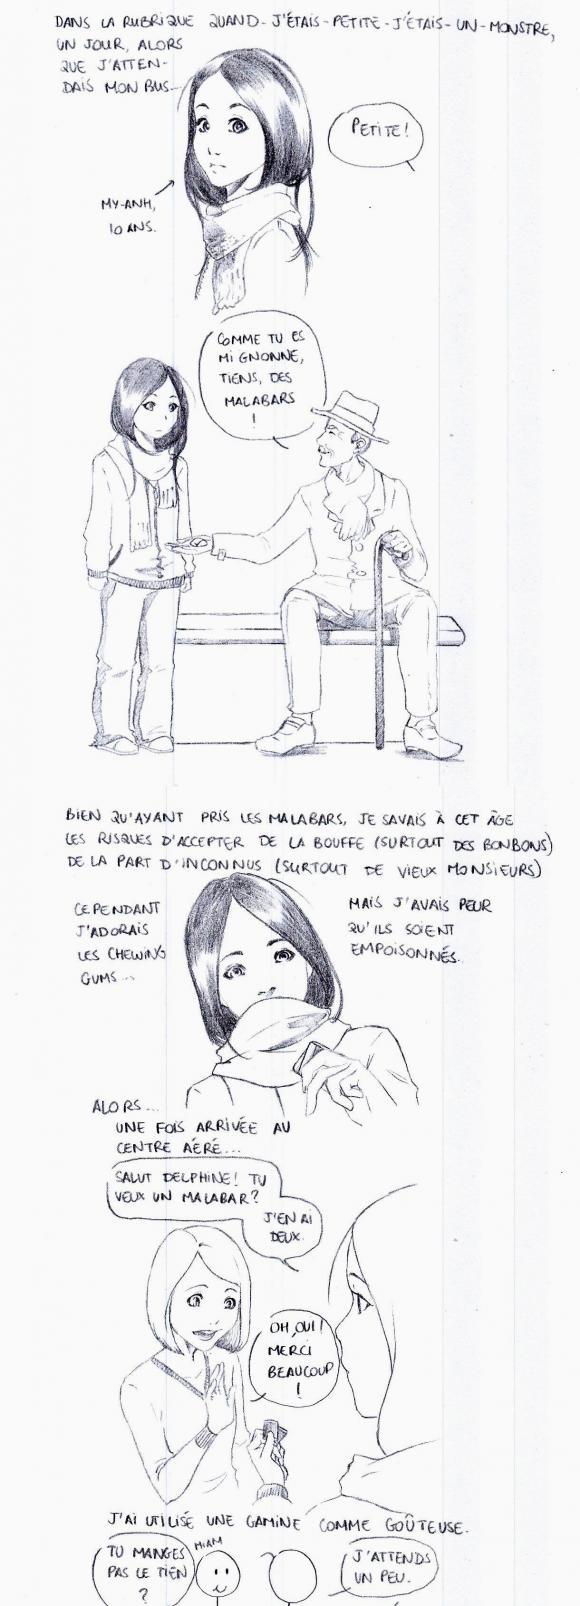 http://laceliah.cowblog.fr/images/Striplife/malabar-copie-1.jpg